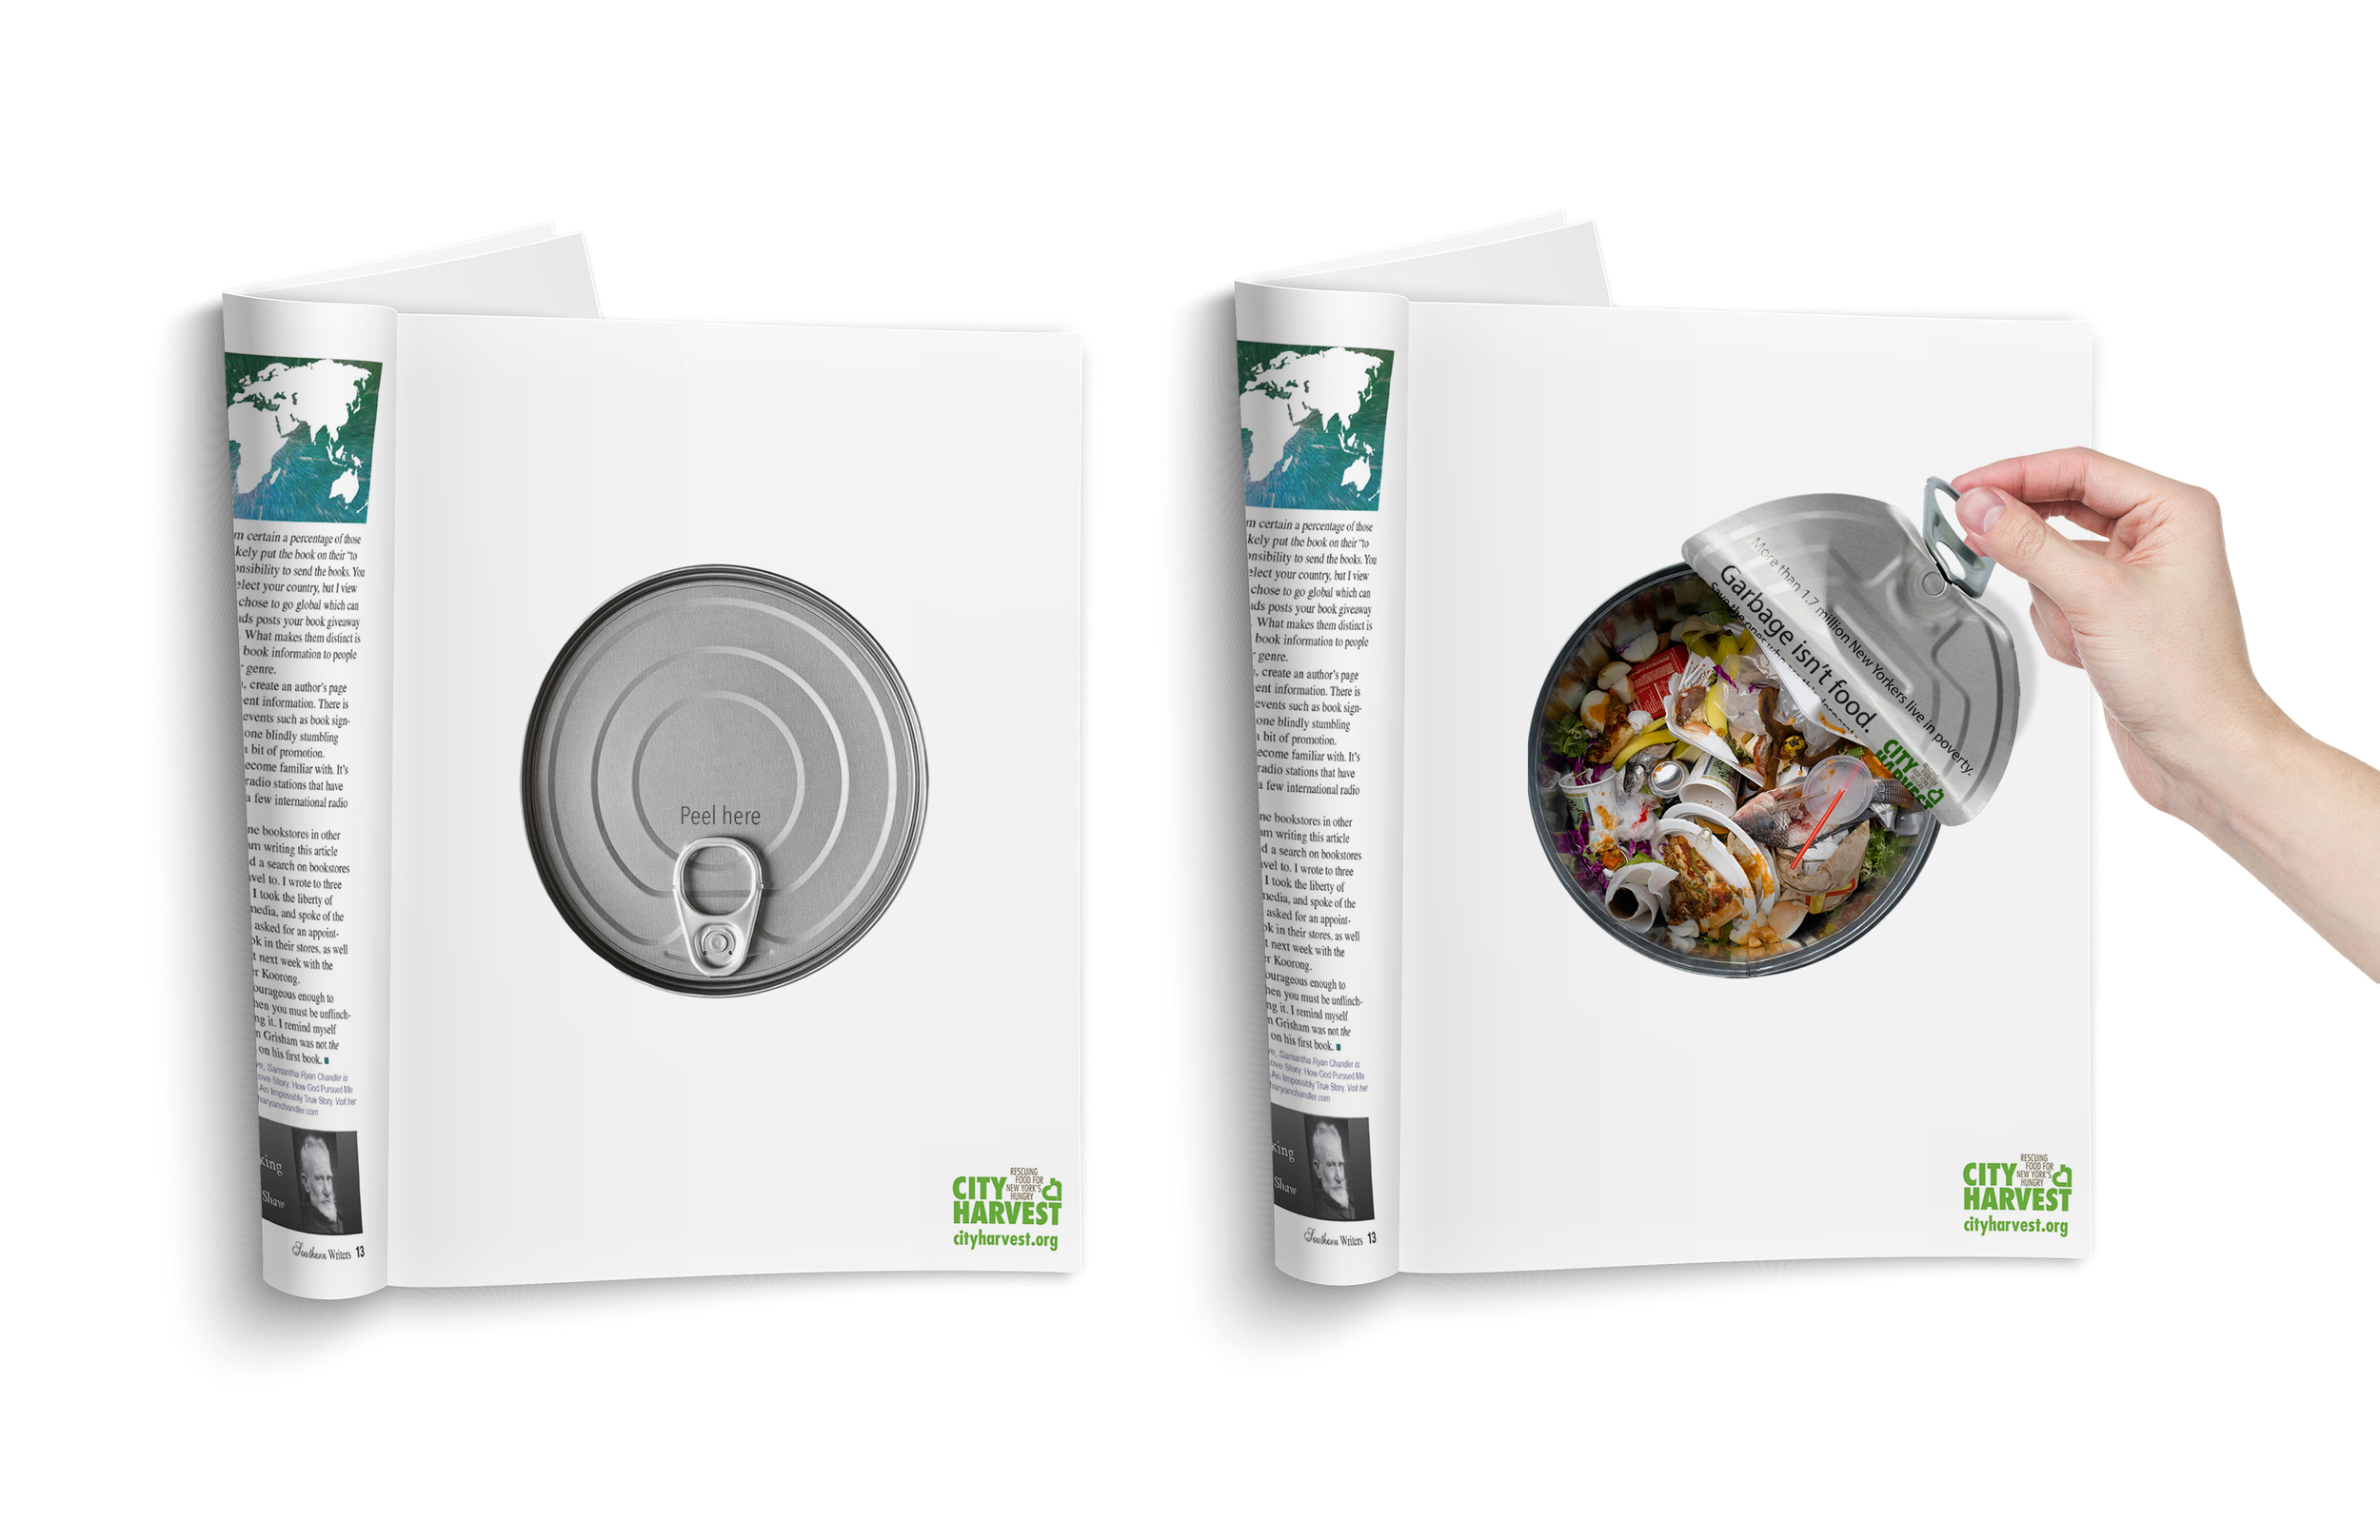 cityharvest-foodcan